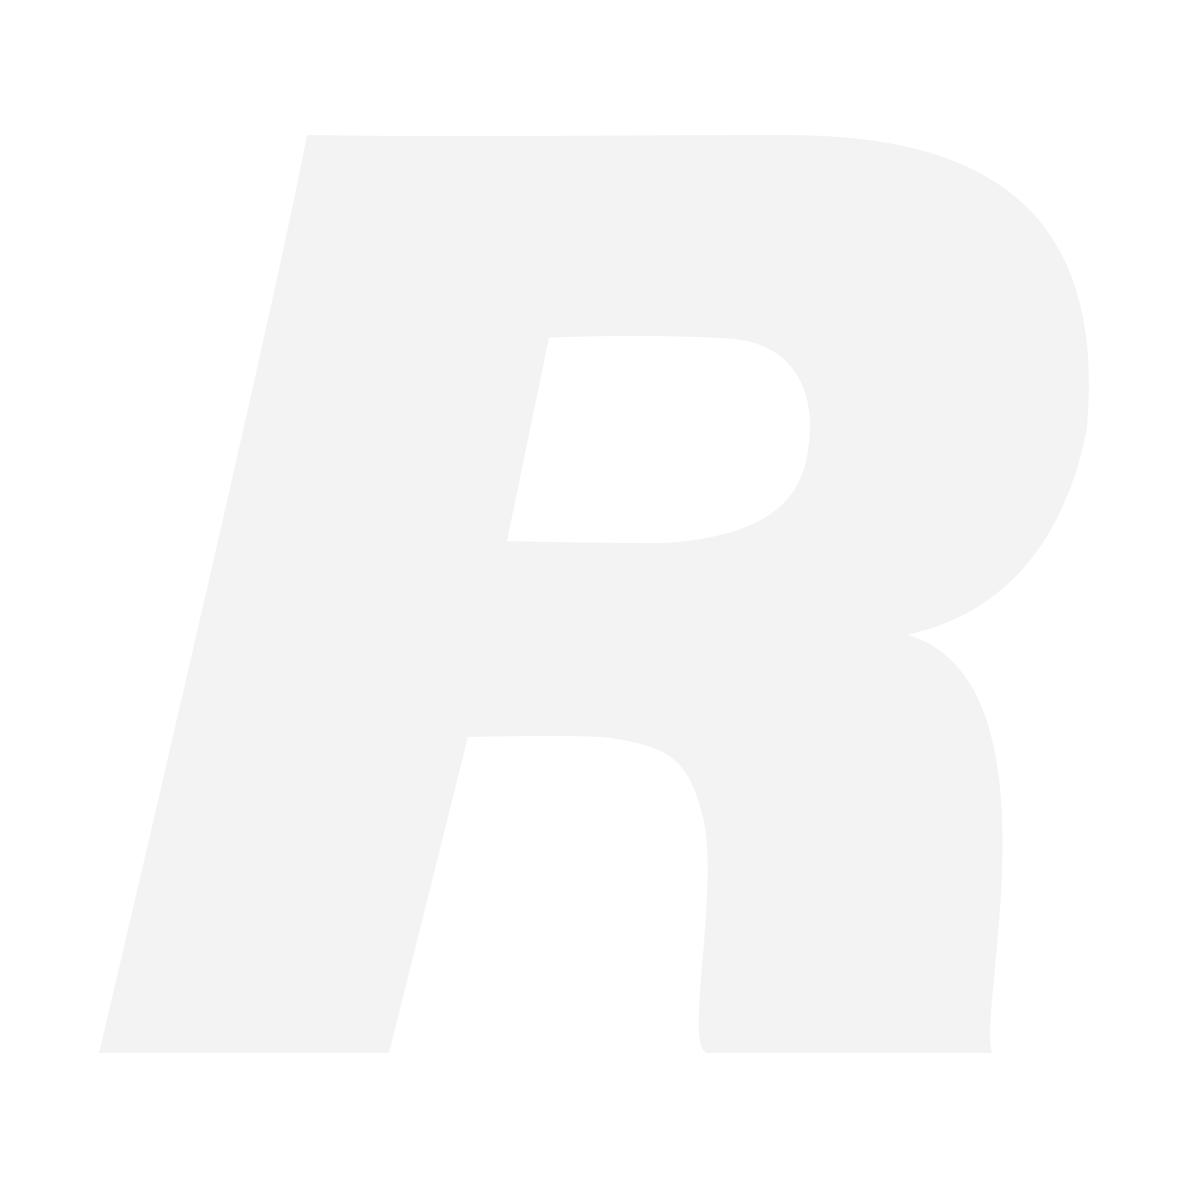 Sony CyberShot DSC-RX100 IV, Svart + VCT-SGR1